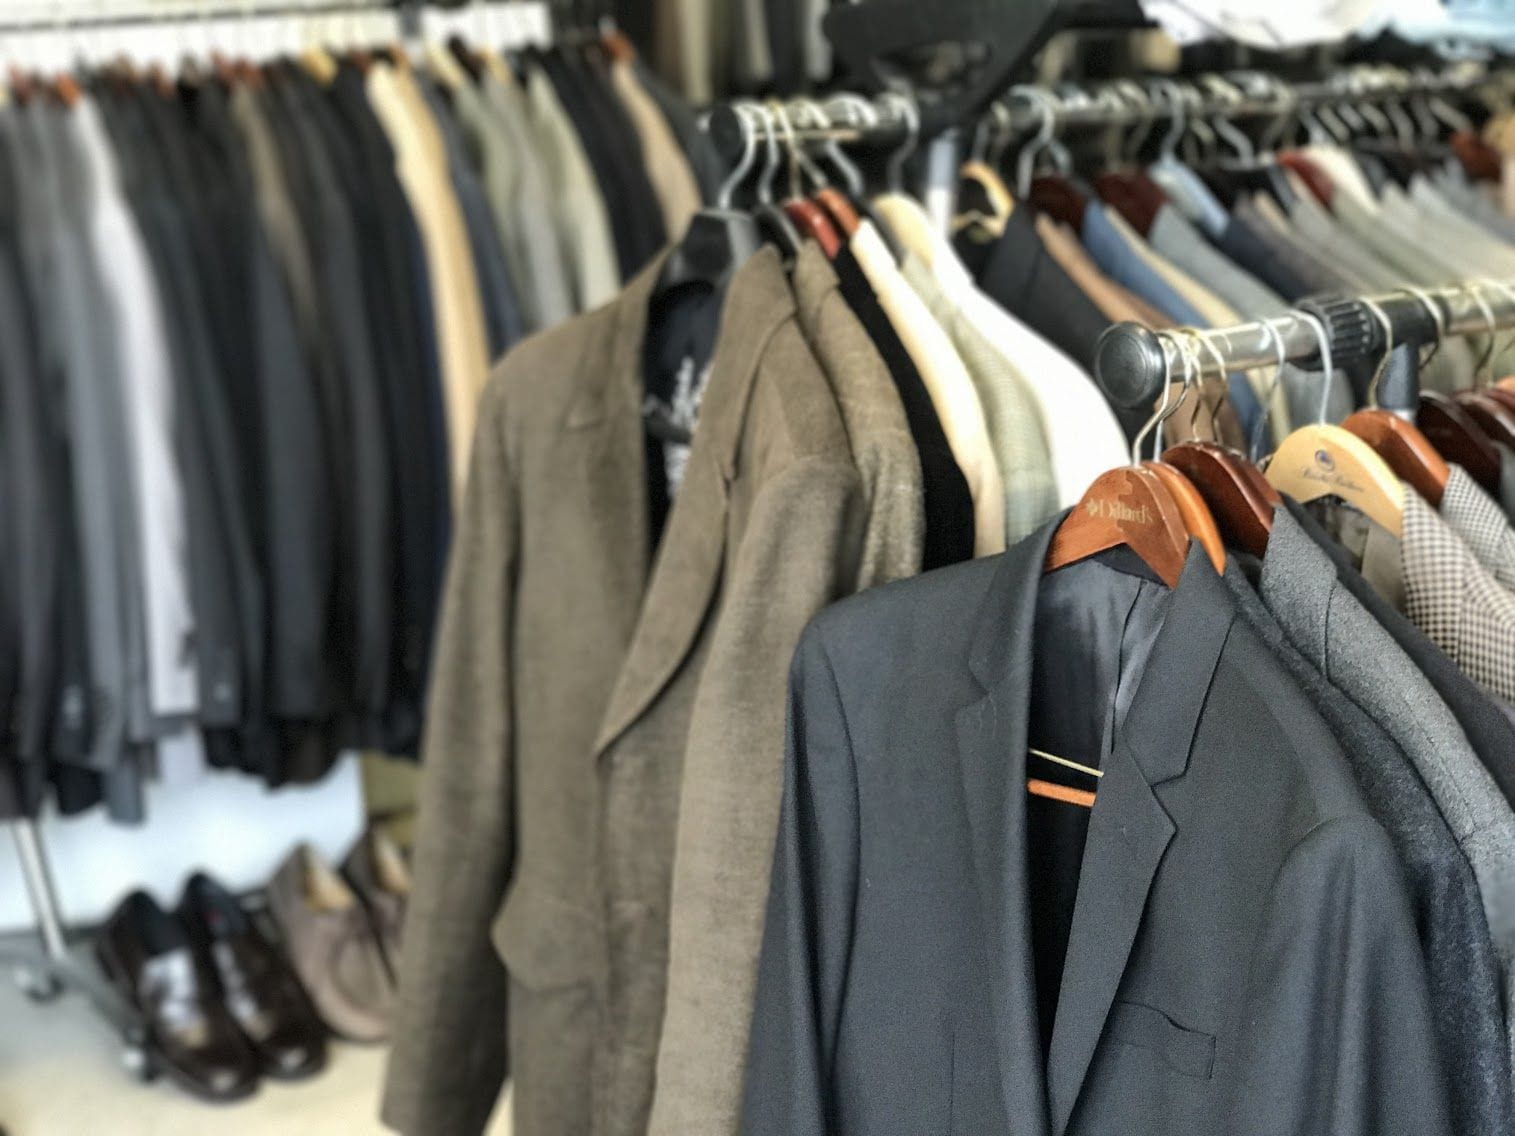 c01cdc0605b Mens Clothes Consignment Shops Near Me